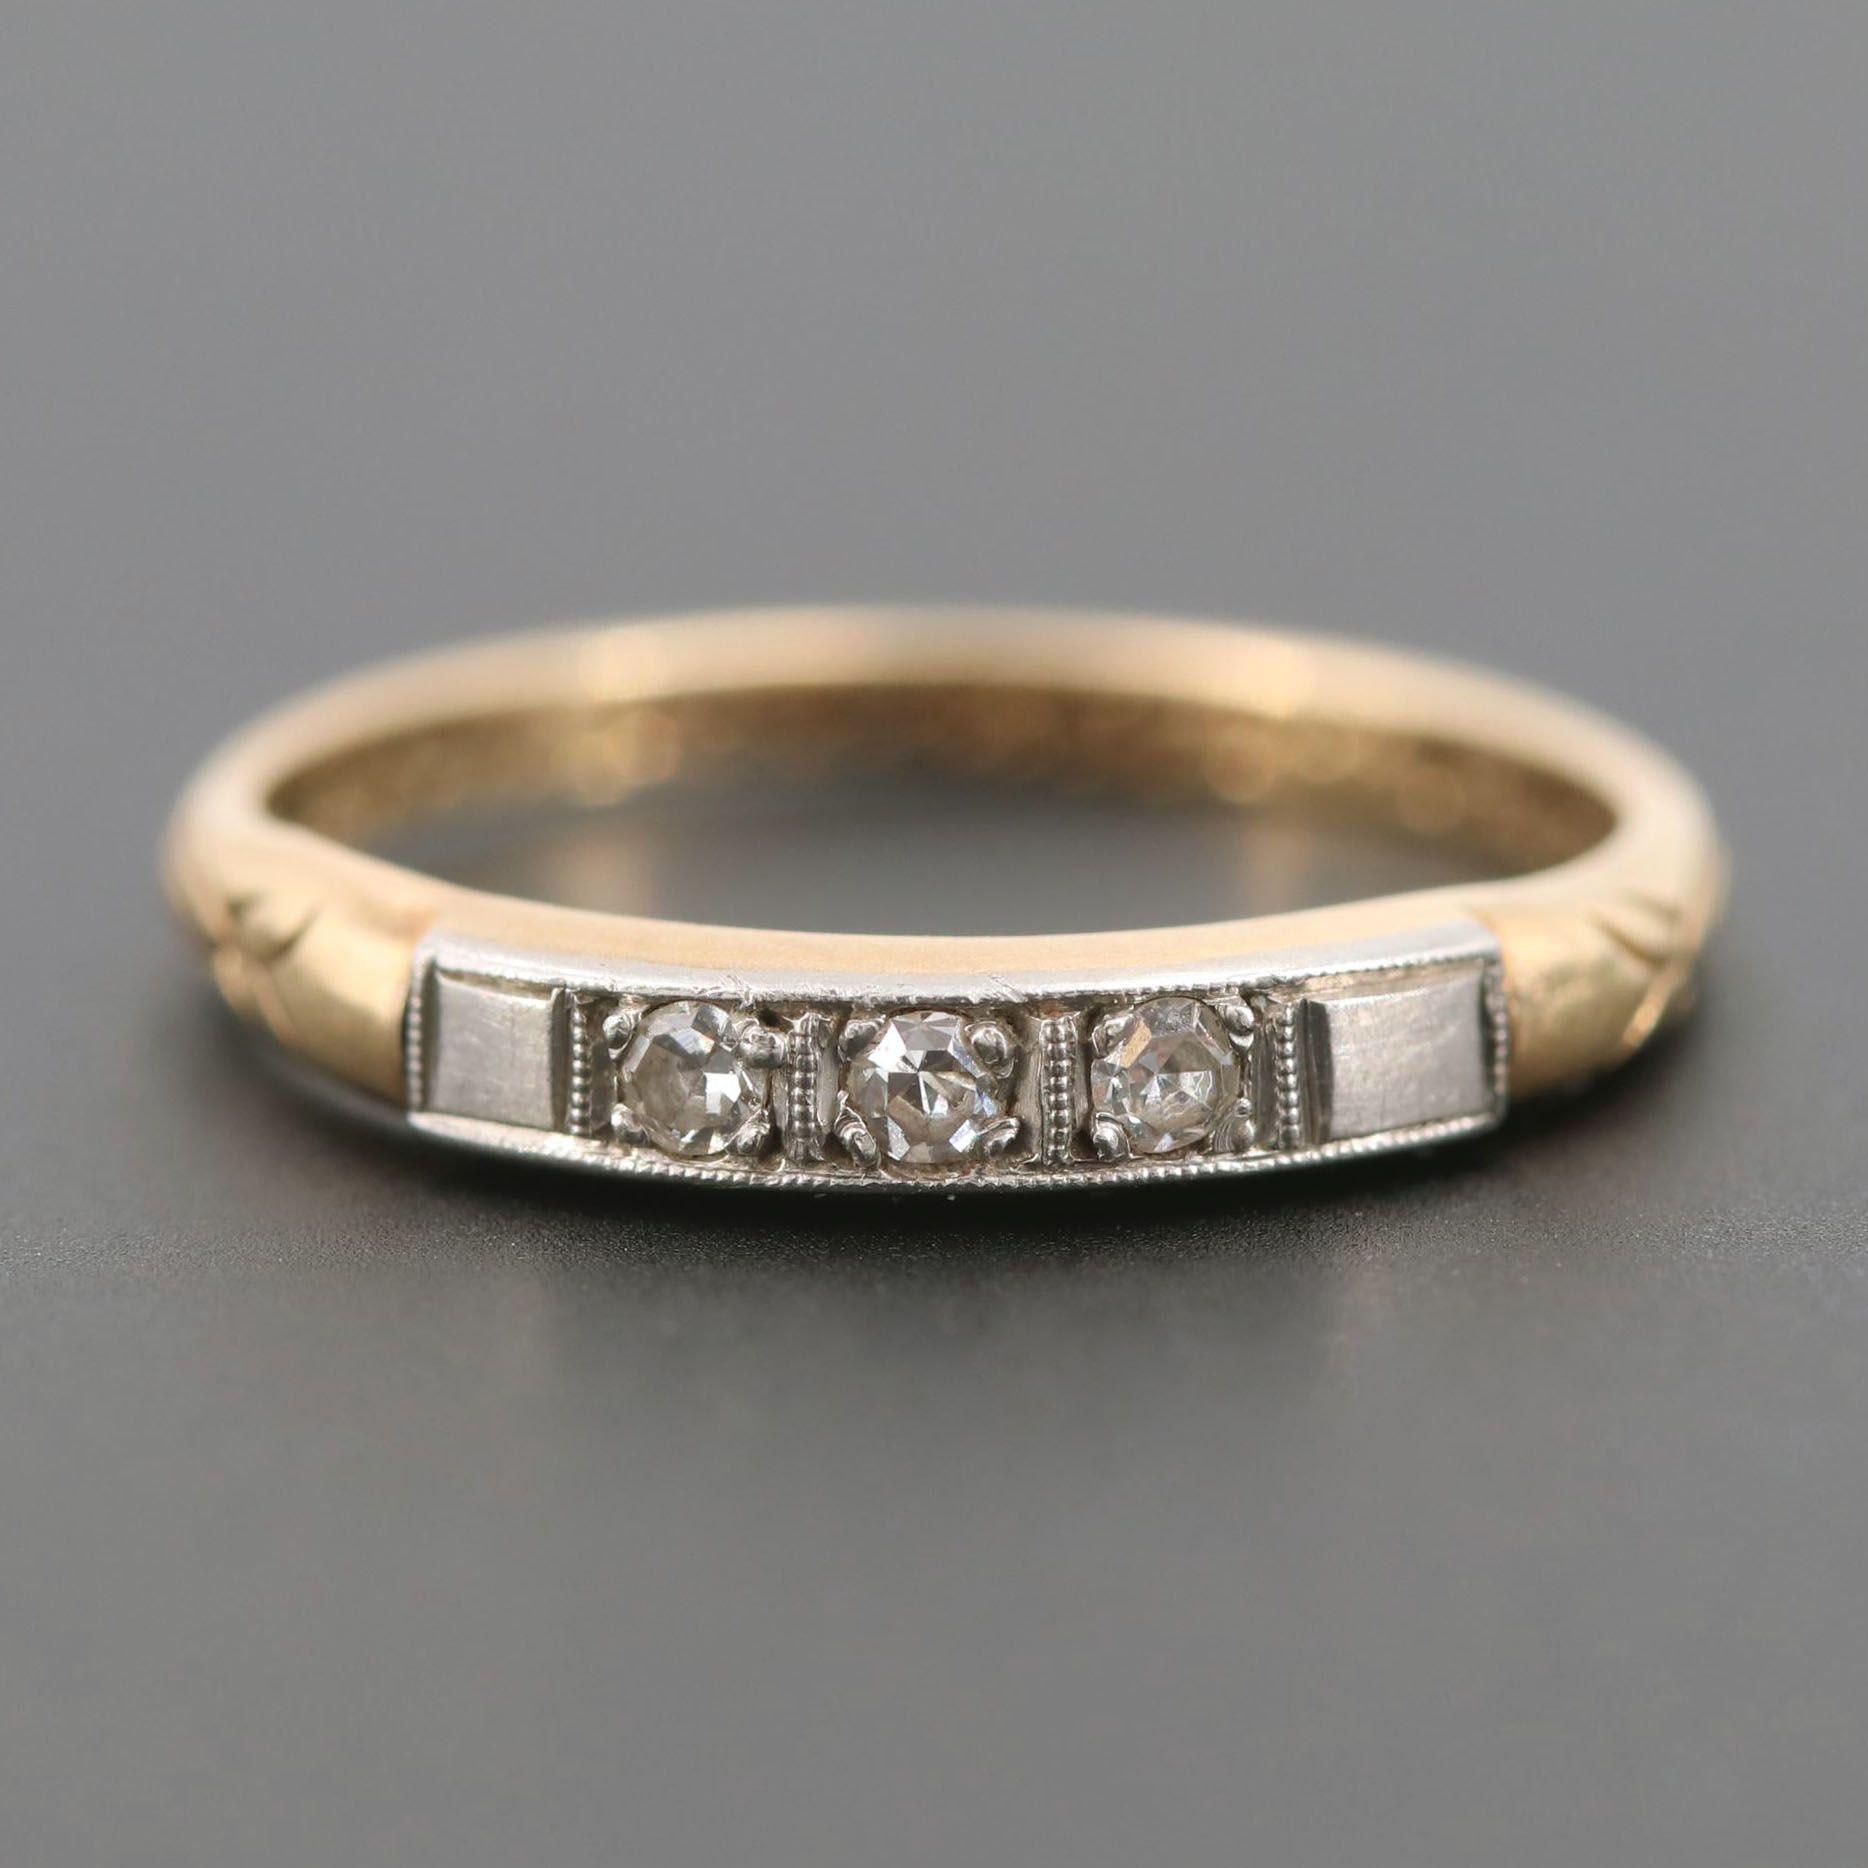 Vintage 14K Yellow Gold and Palladium Diamond Ring